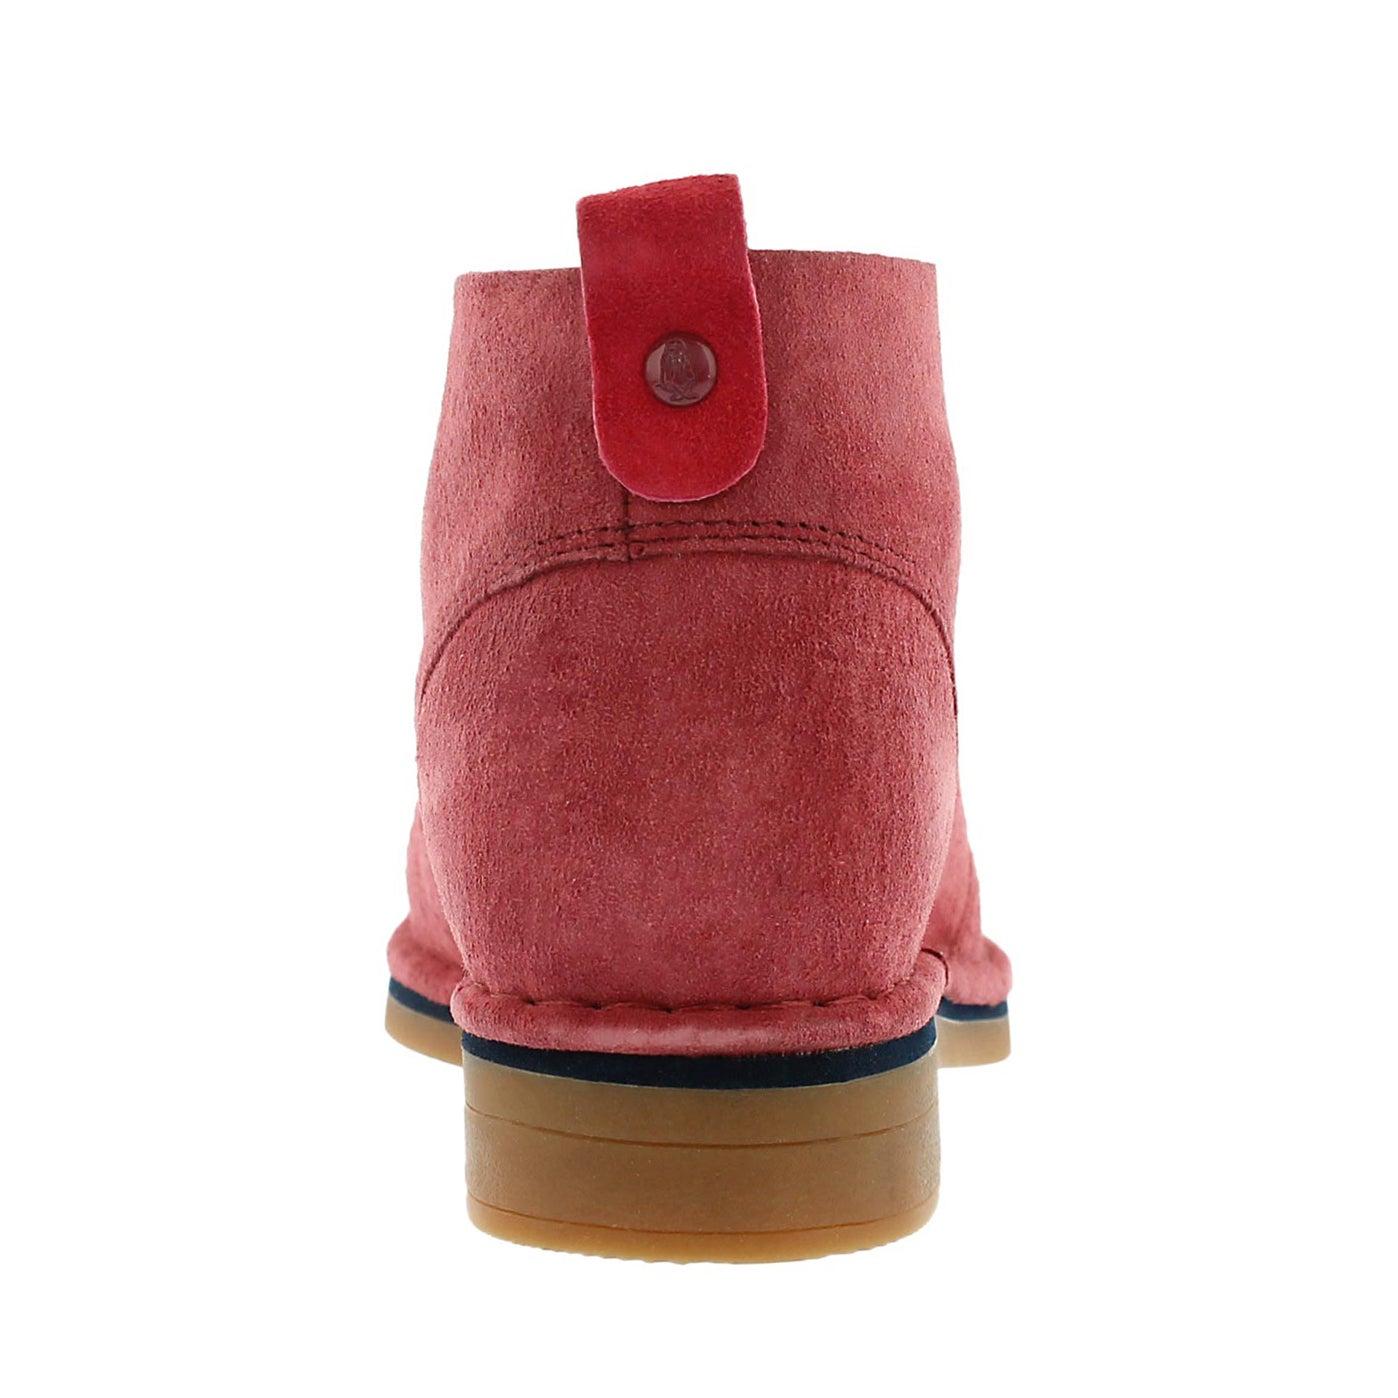 Lds Cyra Catelyn dark red chukka boot